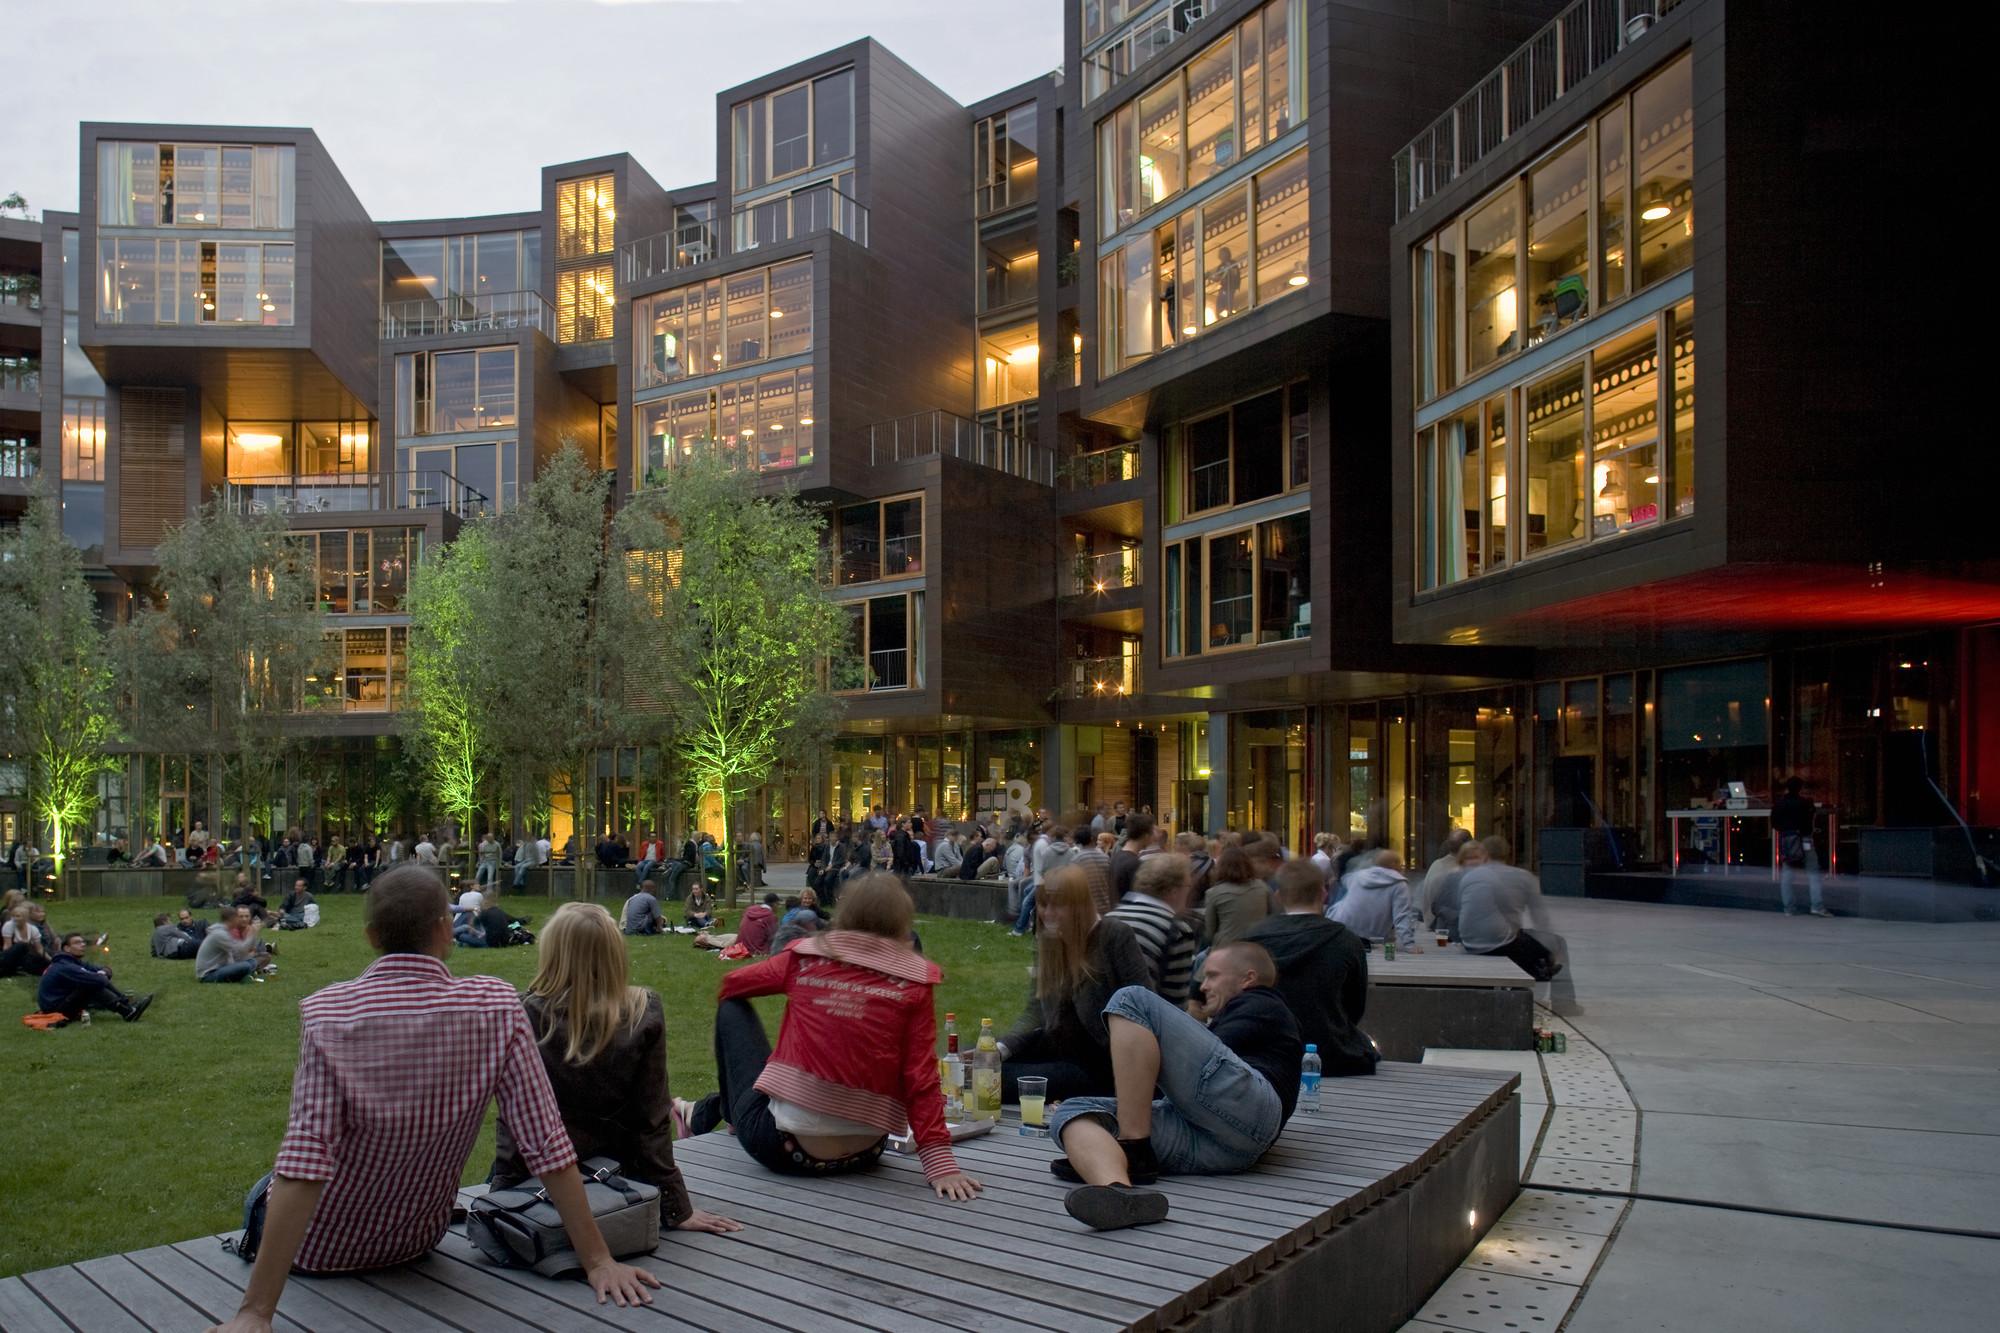 dán építészet_architecture with people_Cykelslangen (1)